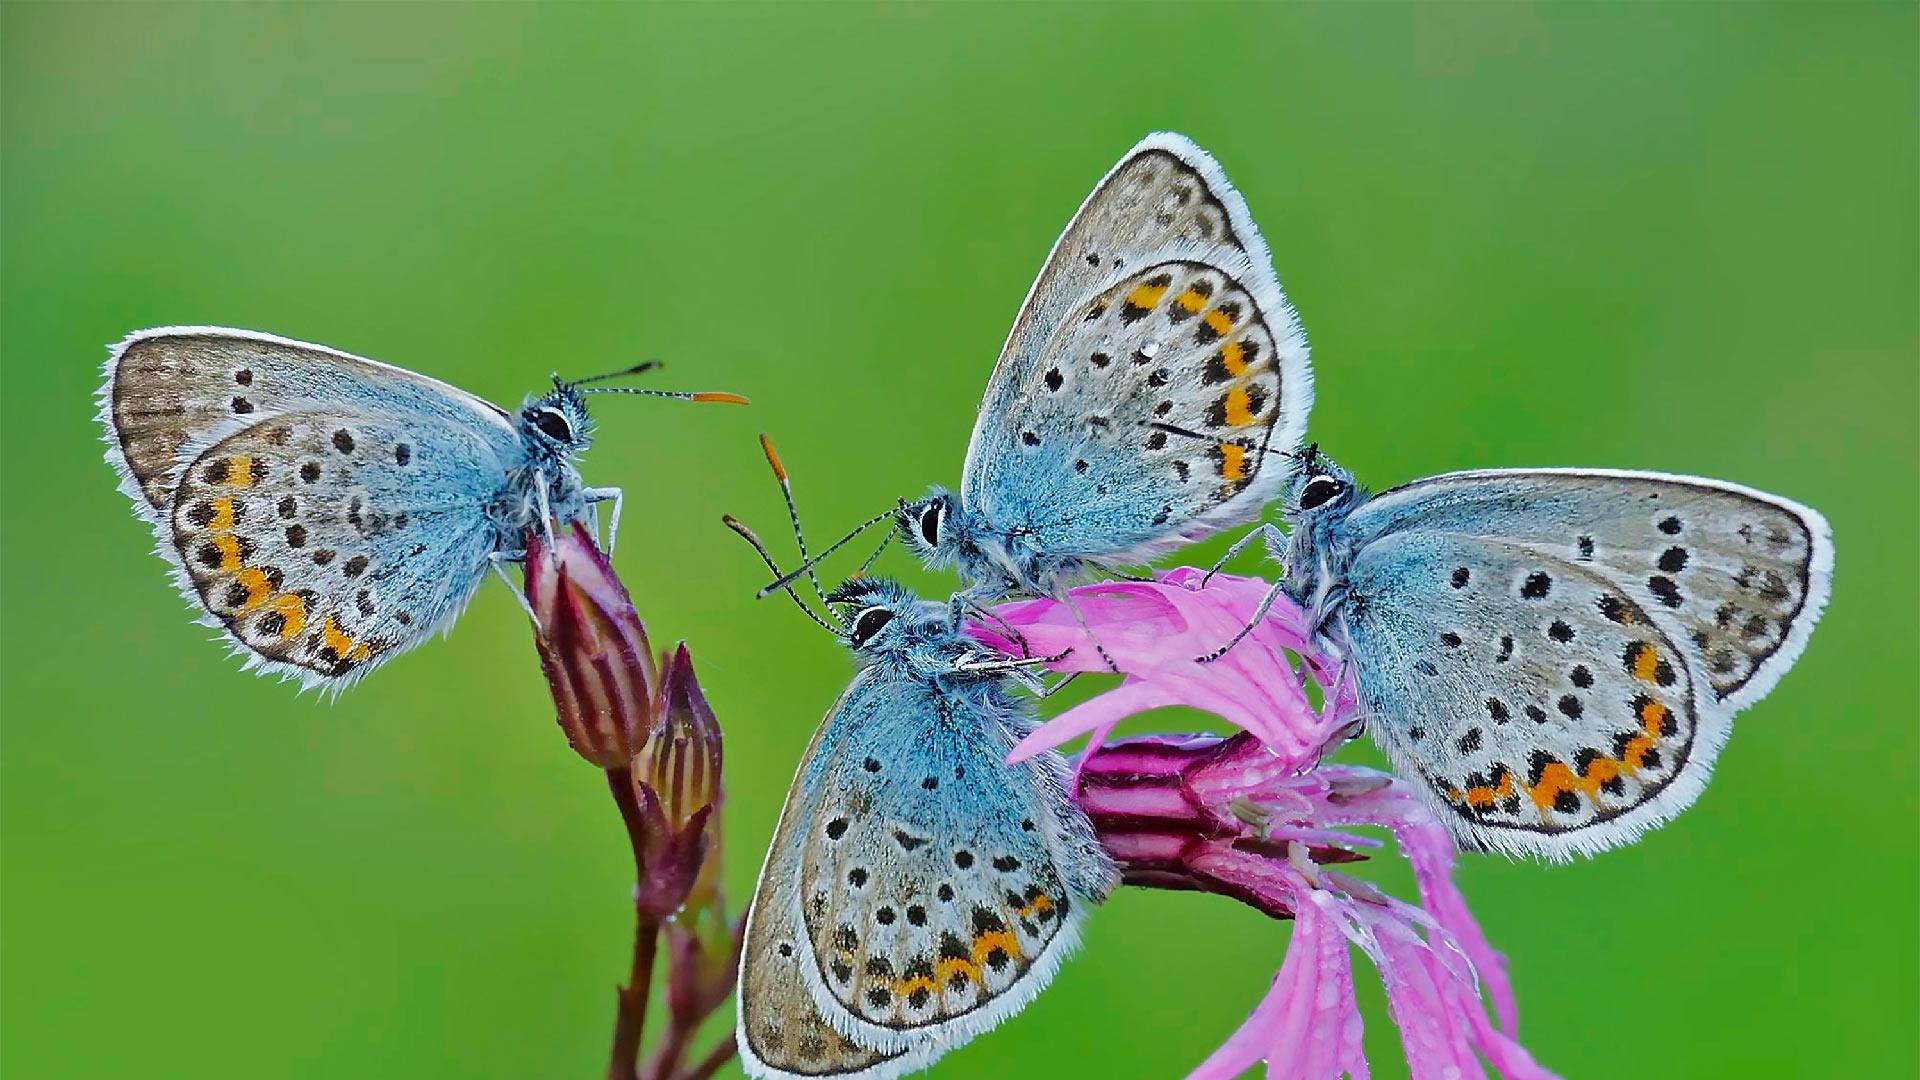 Butterflies in the Regional Park of Castelli Romani, Italy (© Solent News/Splash News/Corbis)